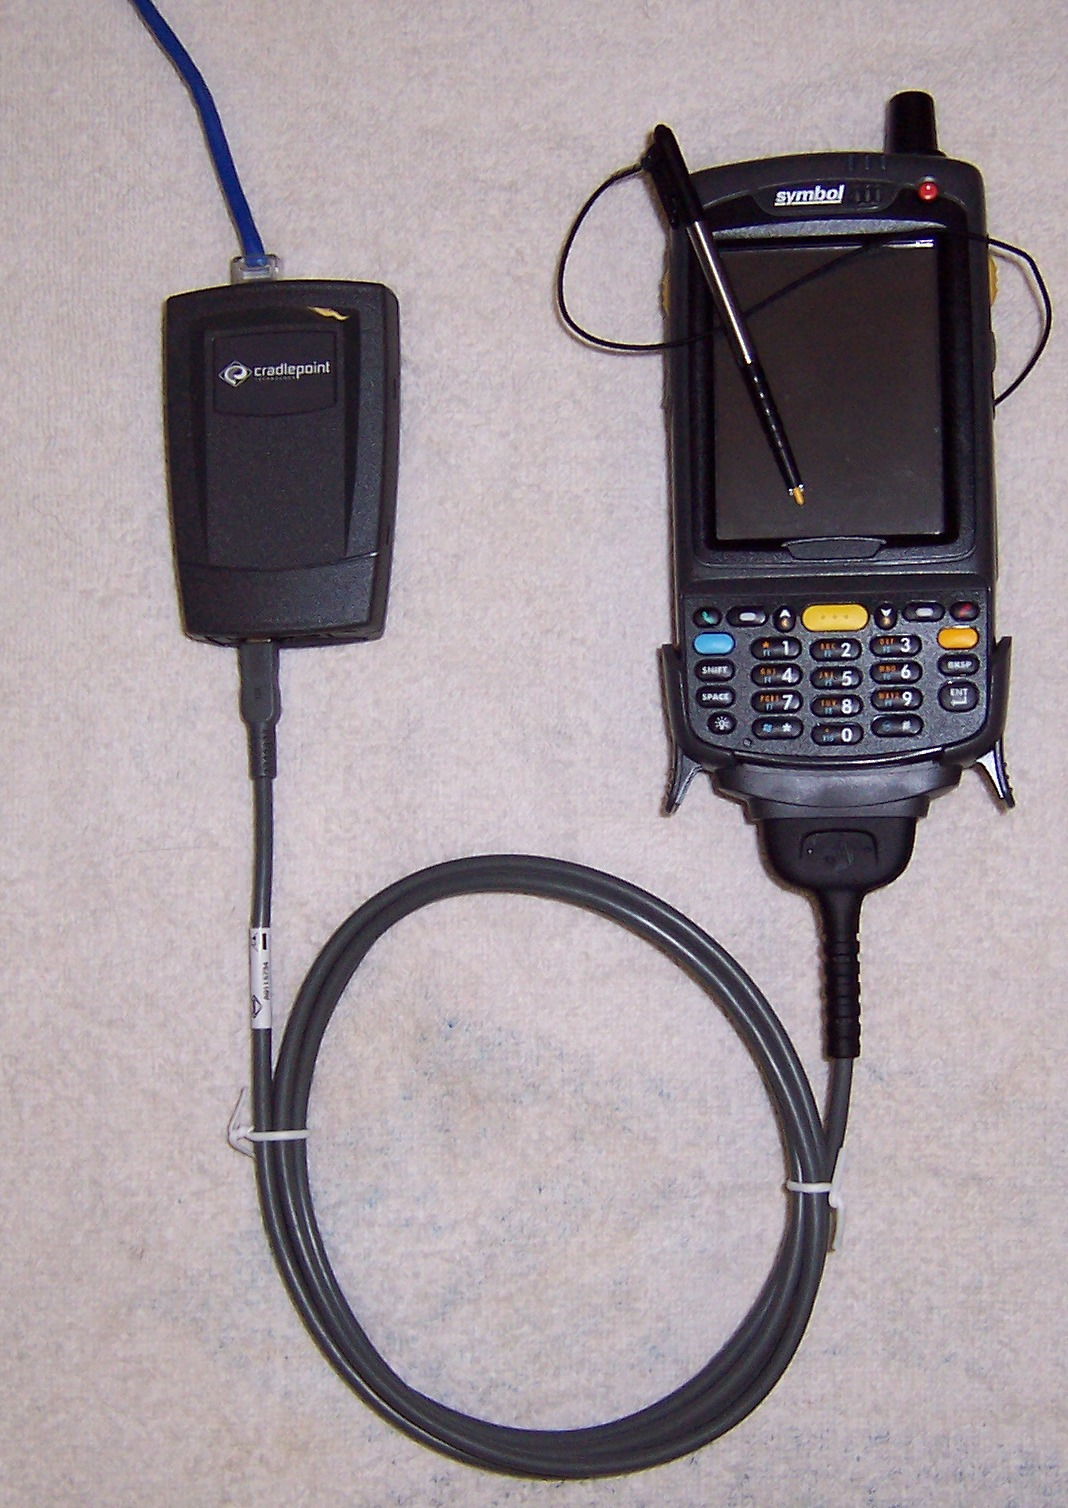 motorola mc75 mobile computer